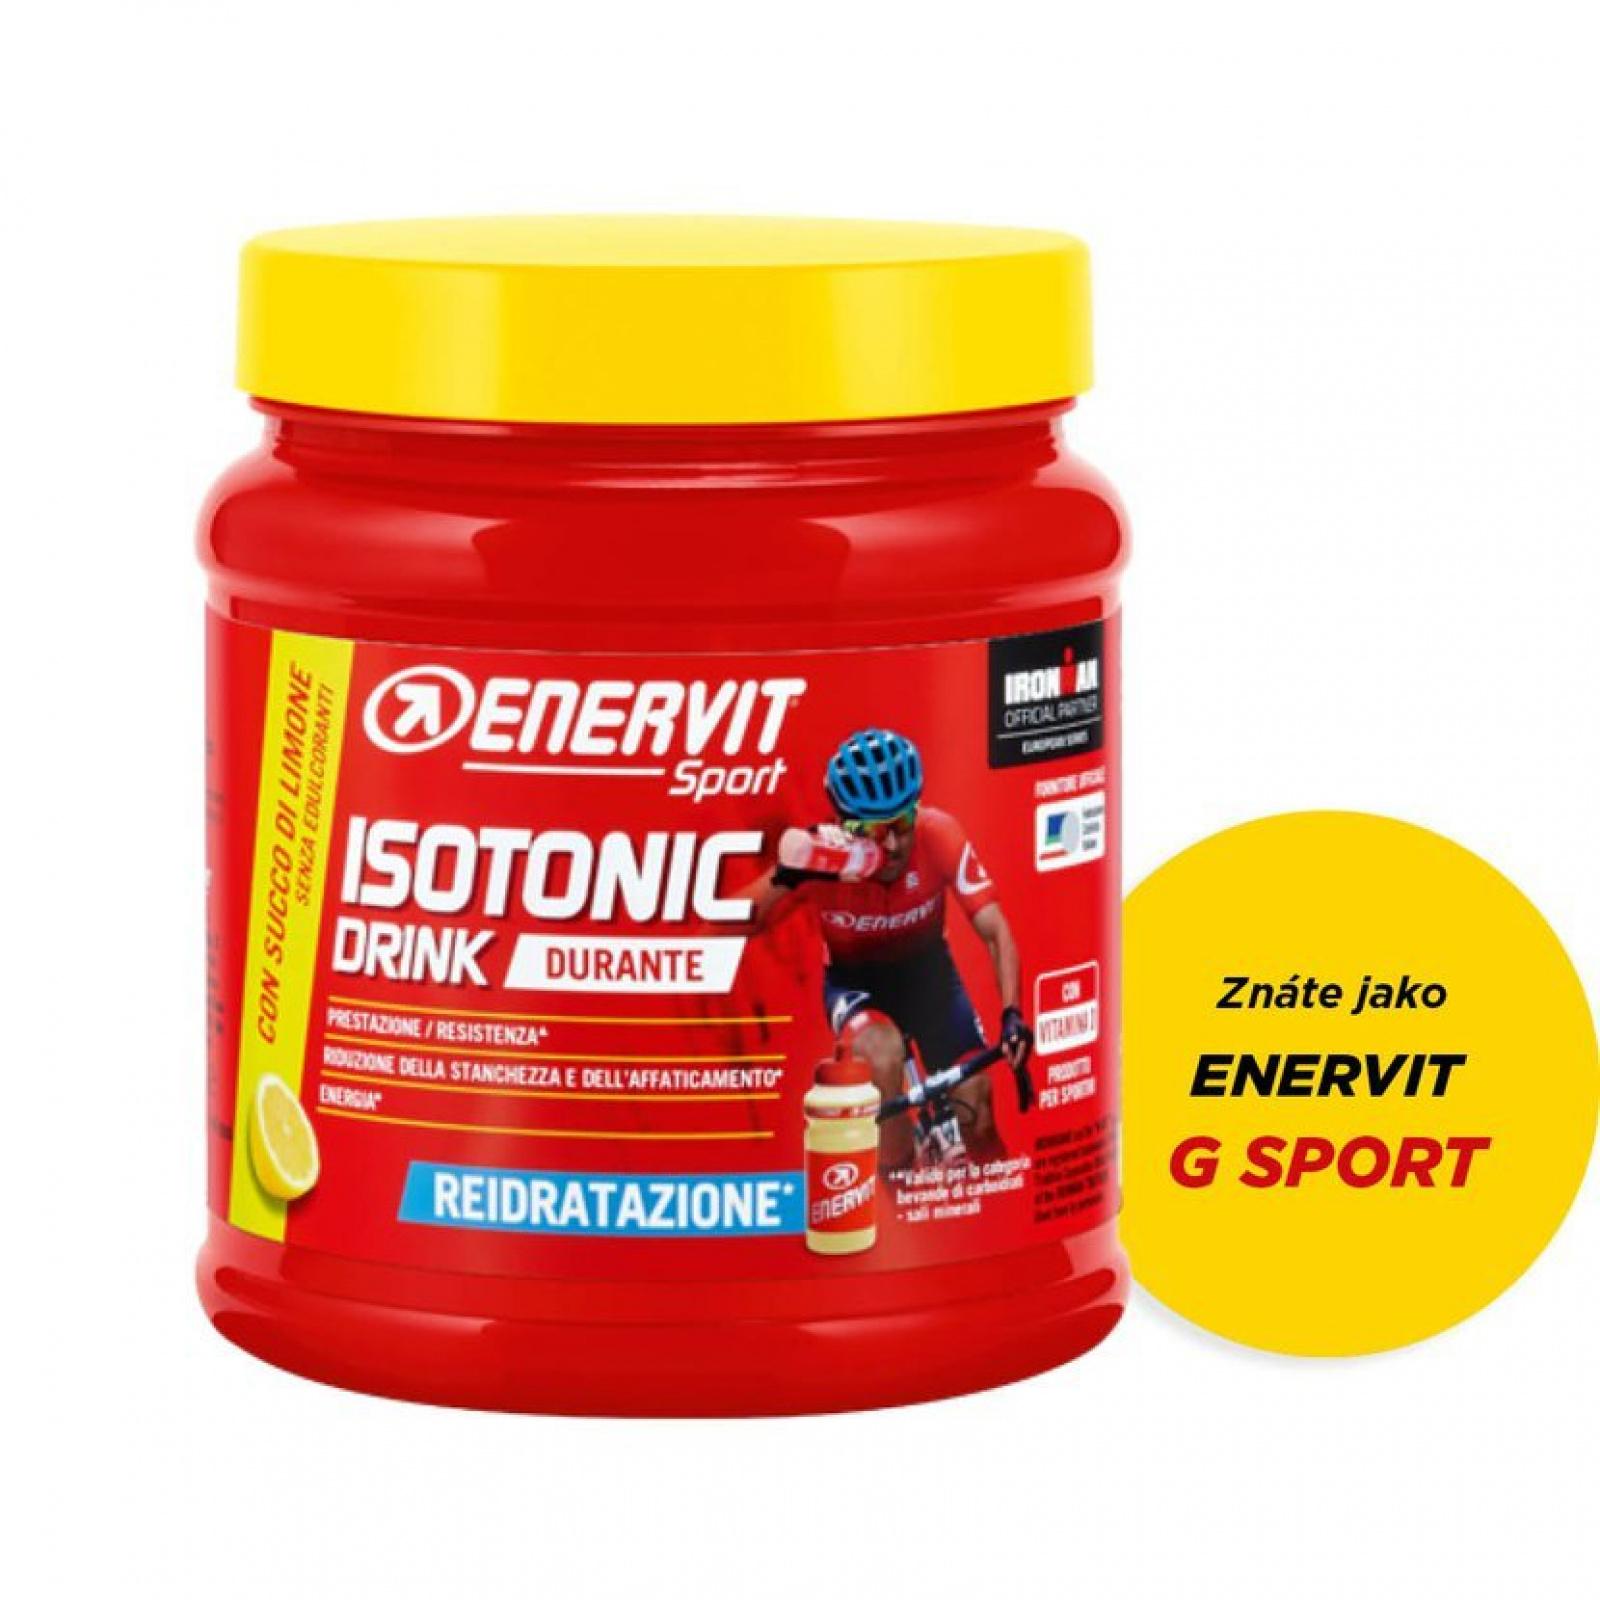 https://www.badec.store/produkty_img/enervit-isotonic-drink1602782643L.jpg